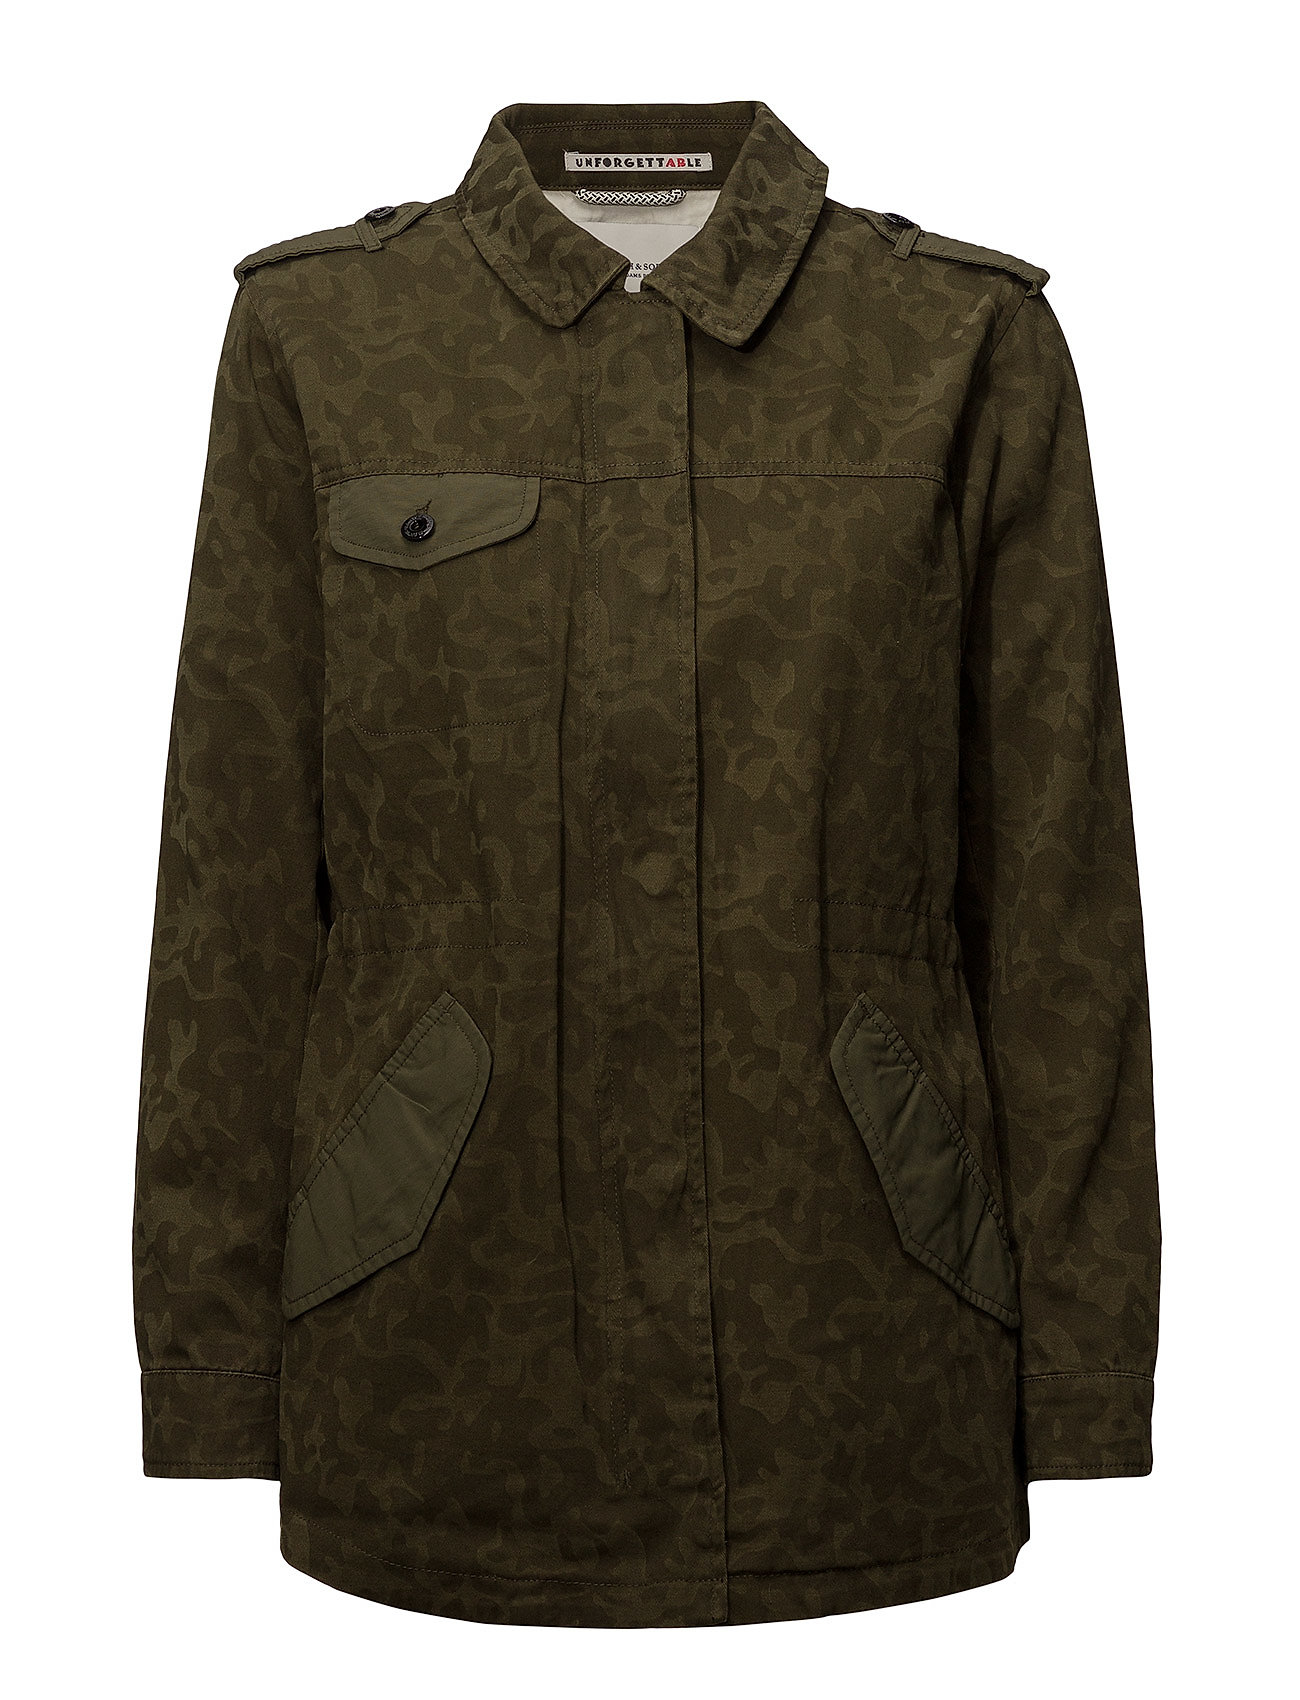 Scotch & Soda Military jacket - MILITARY GREEN